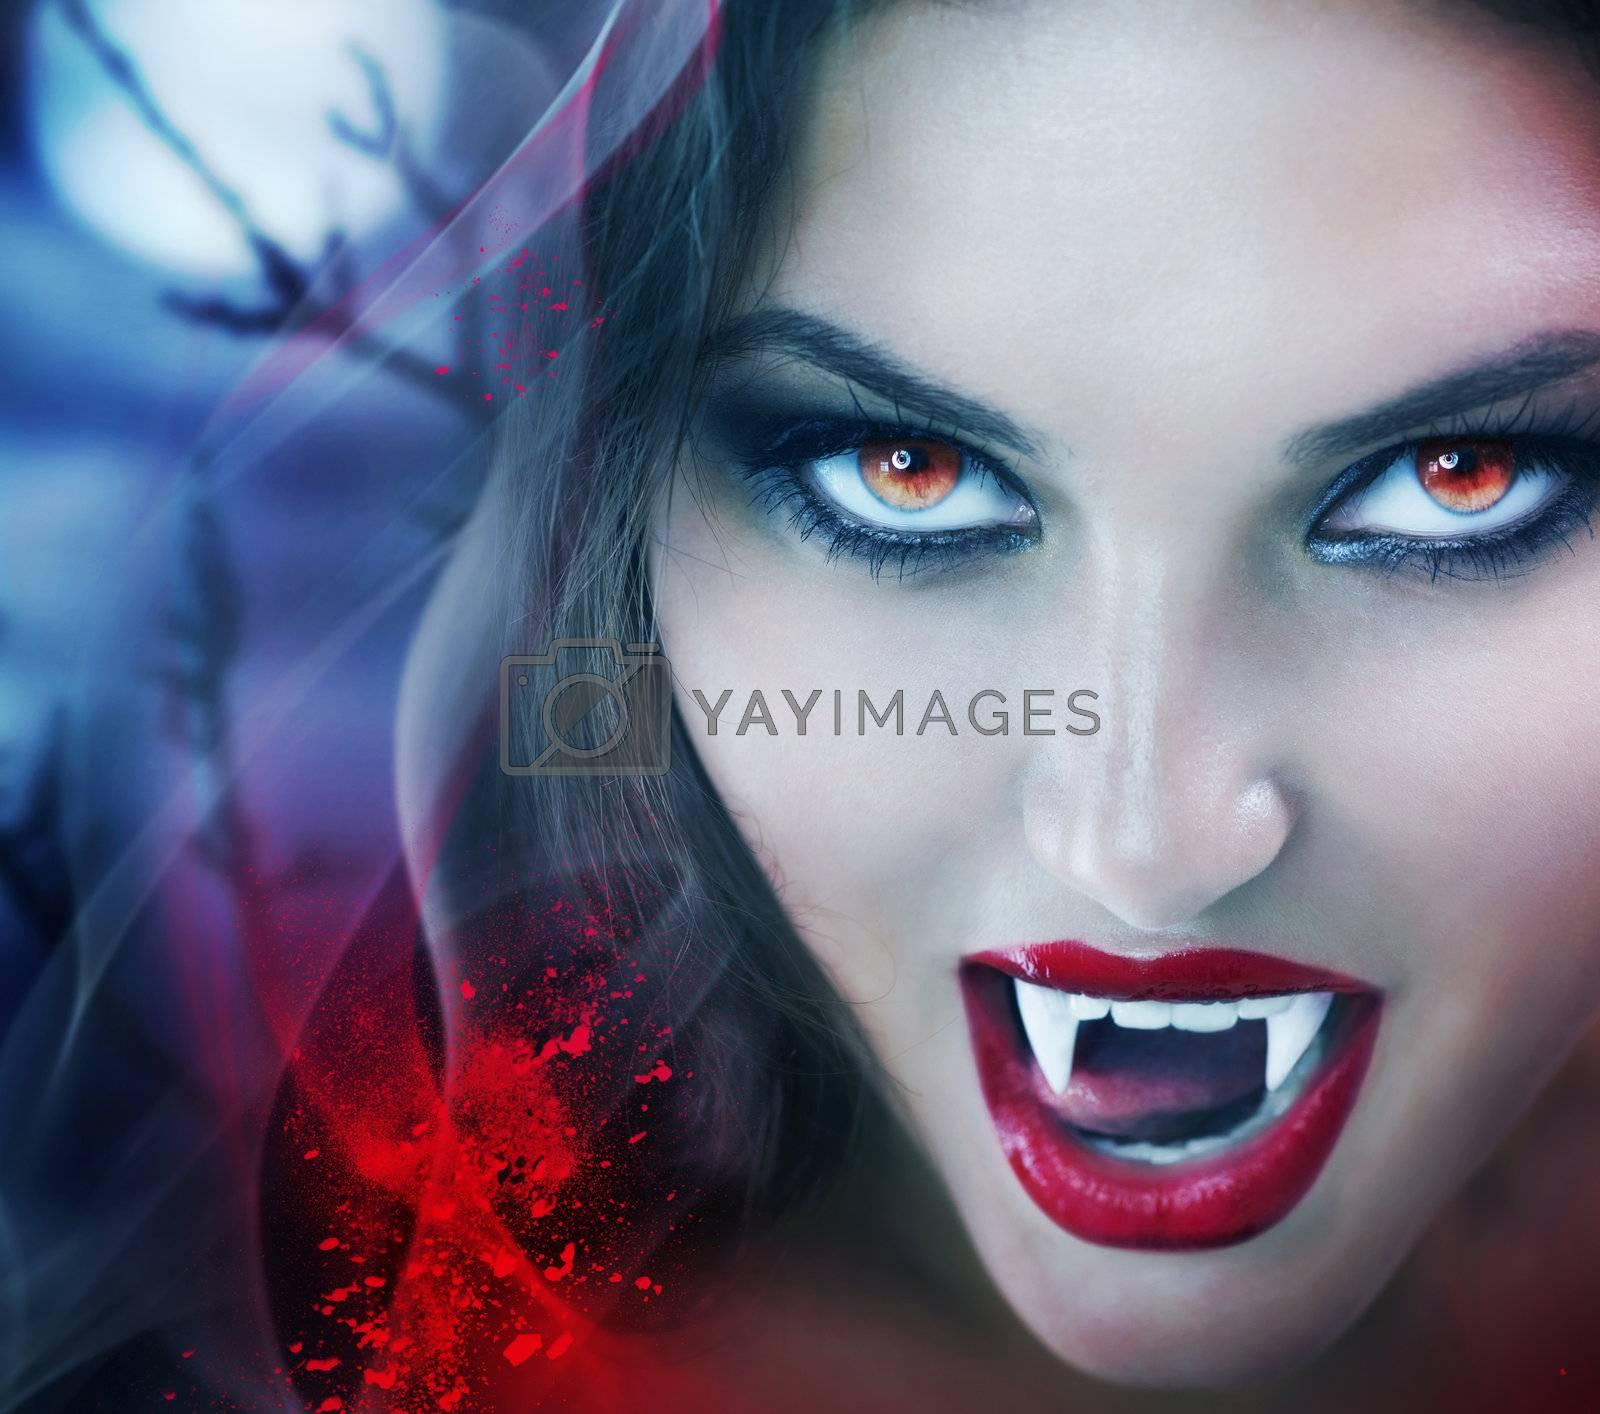 Royalty free image of Vampire by SubbotinaA